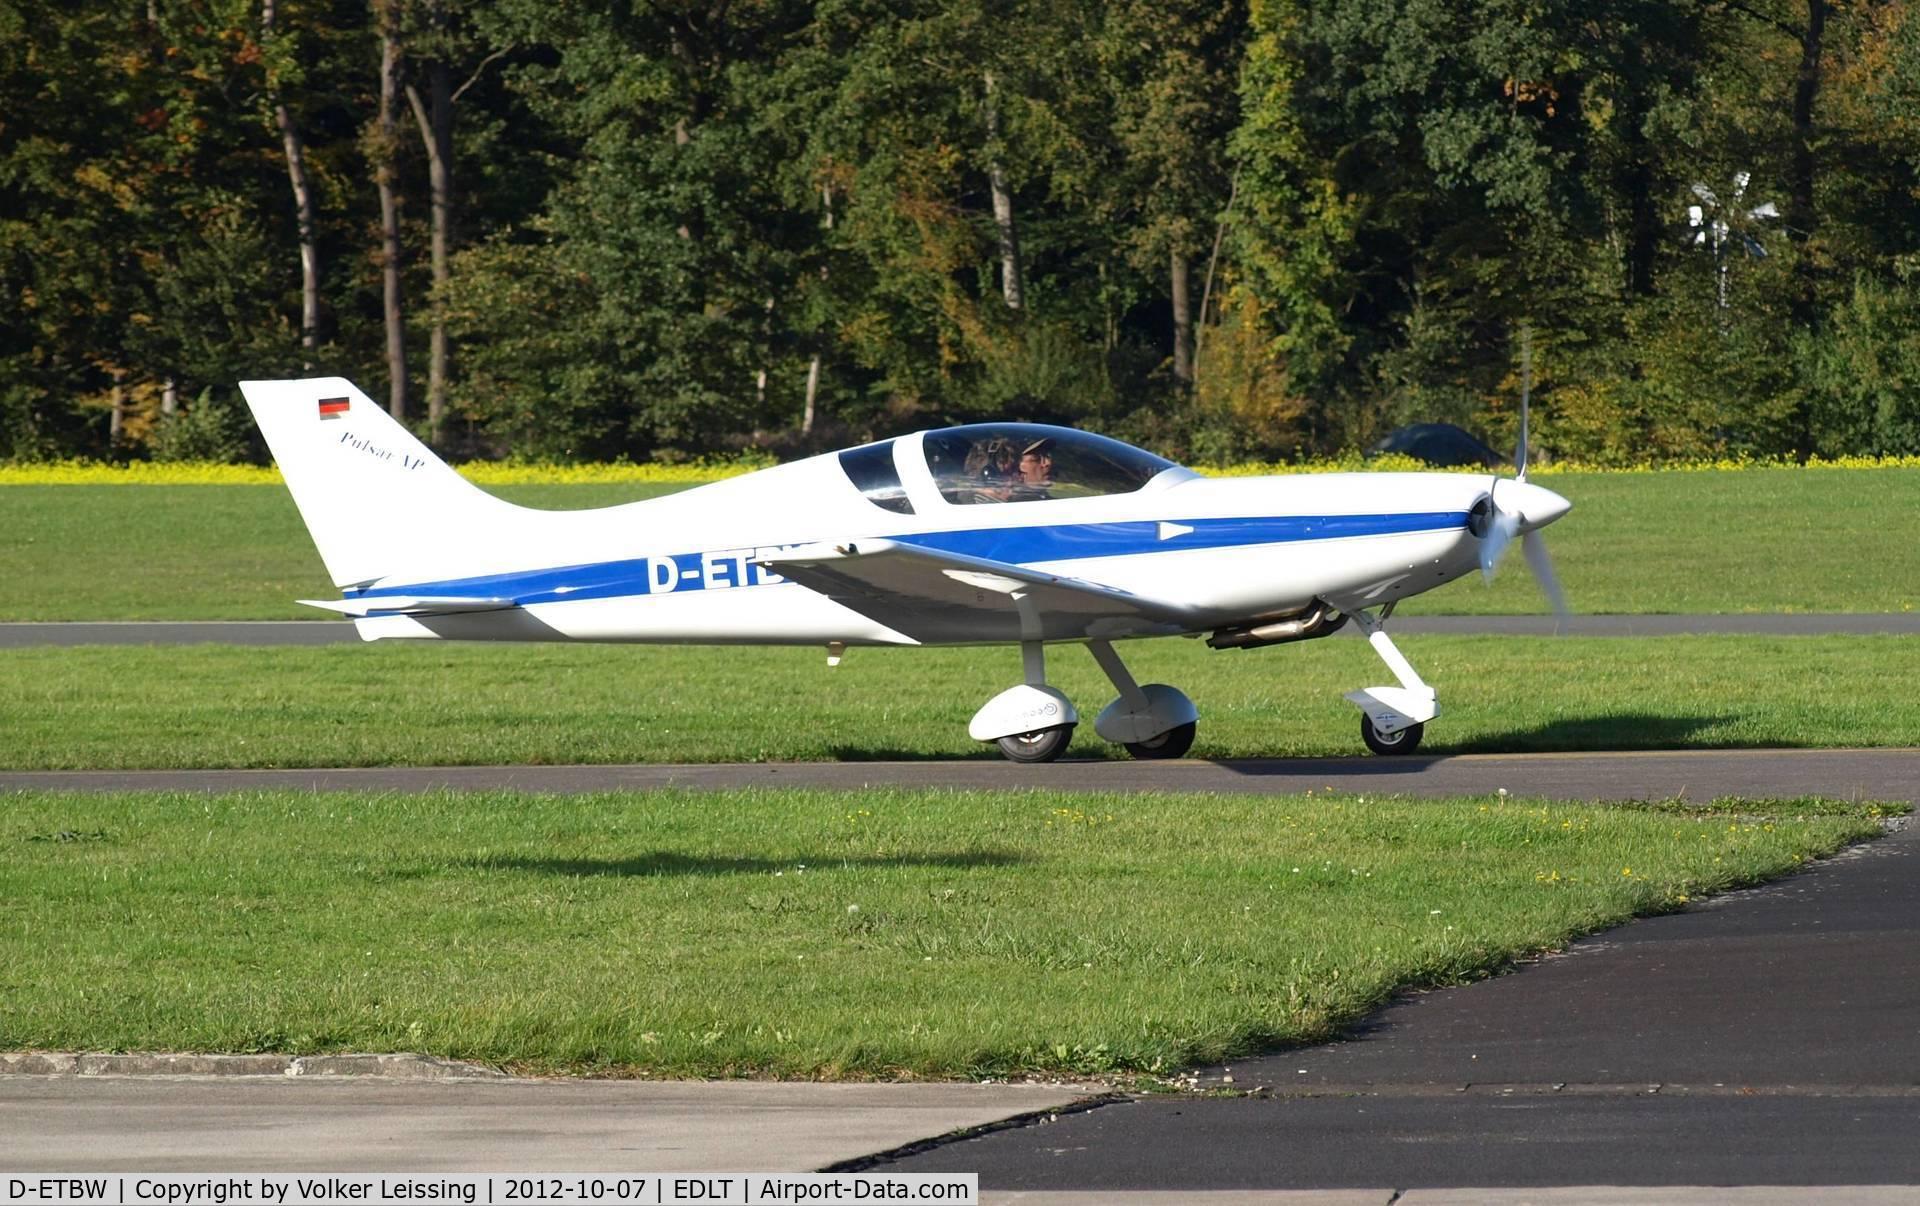 D-ETBW, 1996 Aero Designs Pulsar XP C/N 413, landing